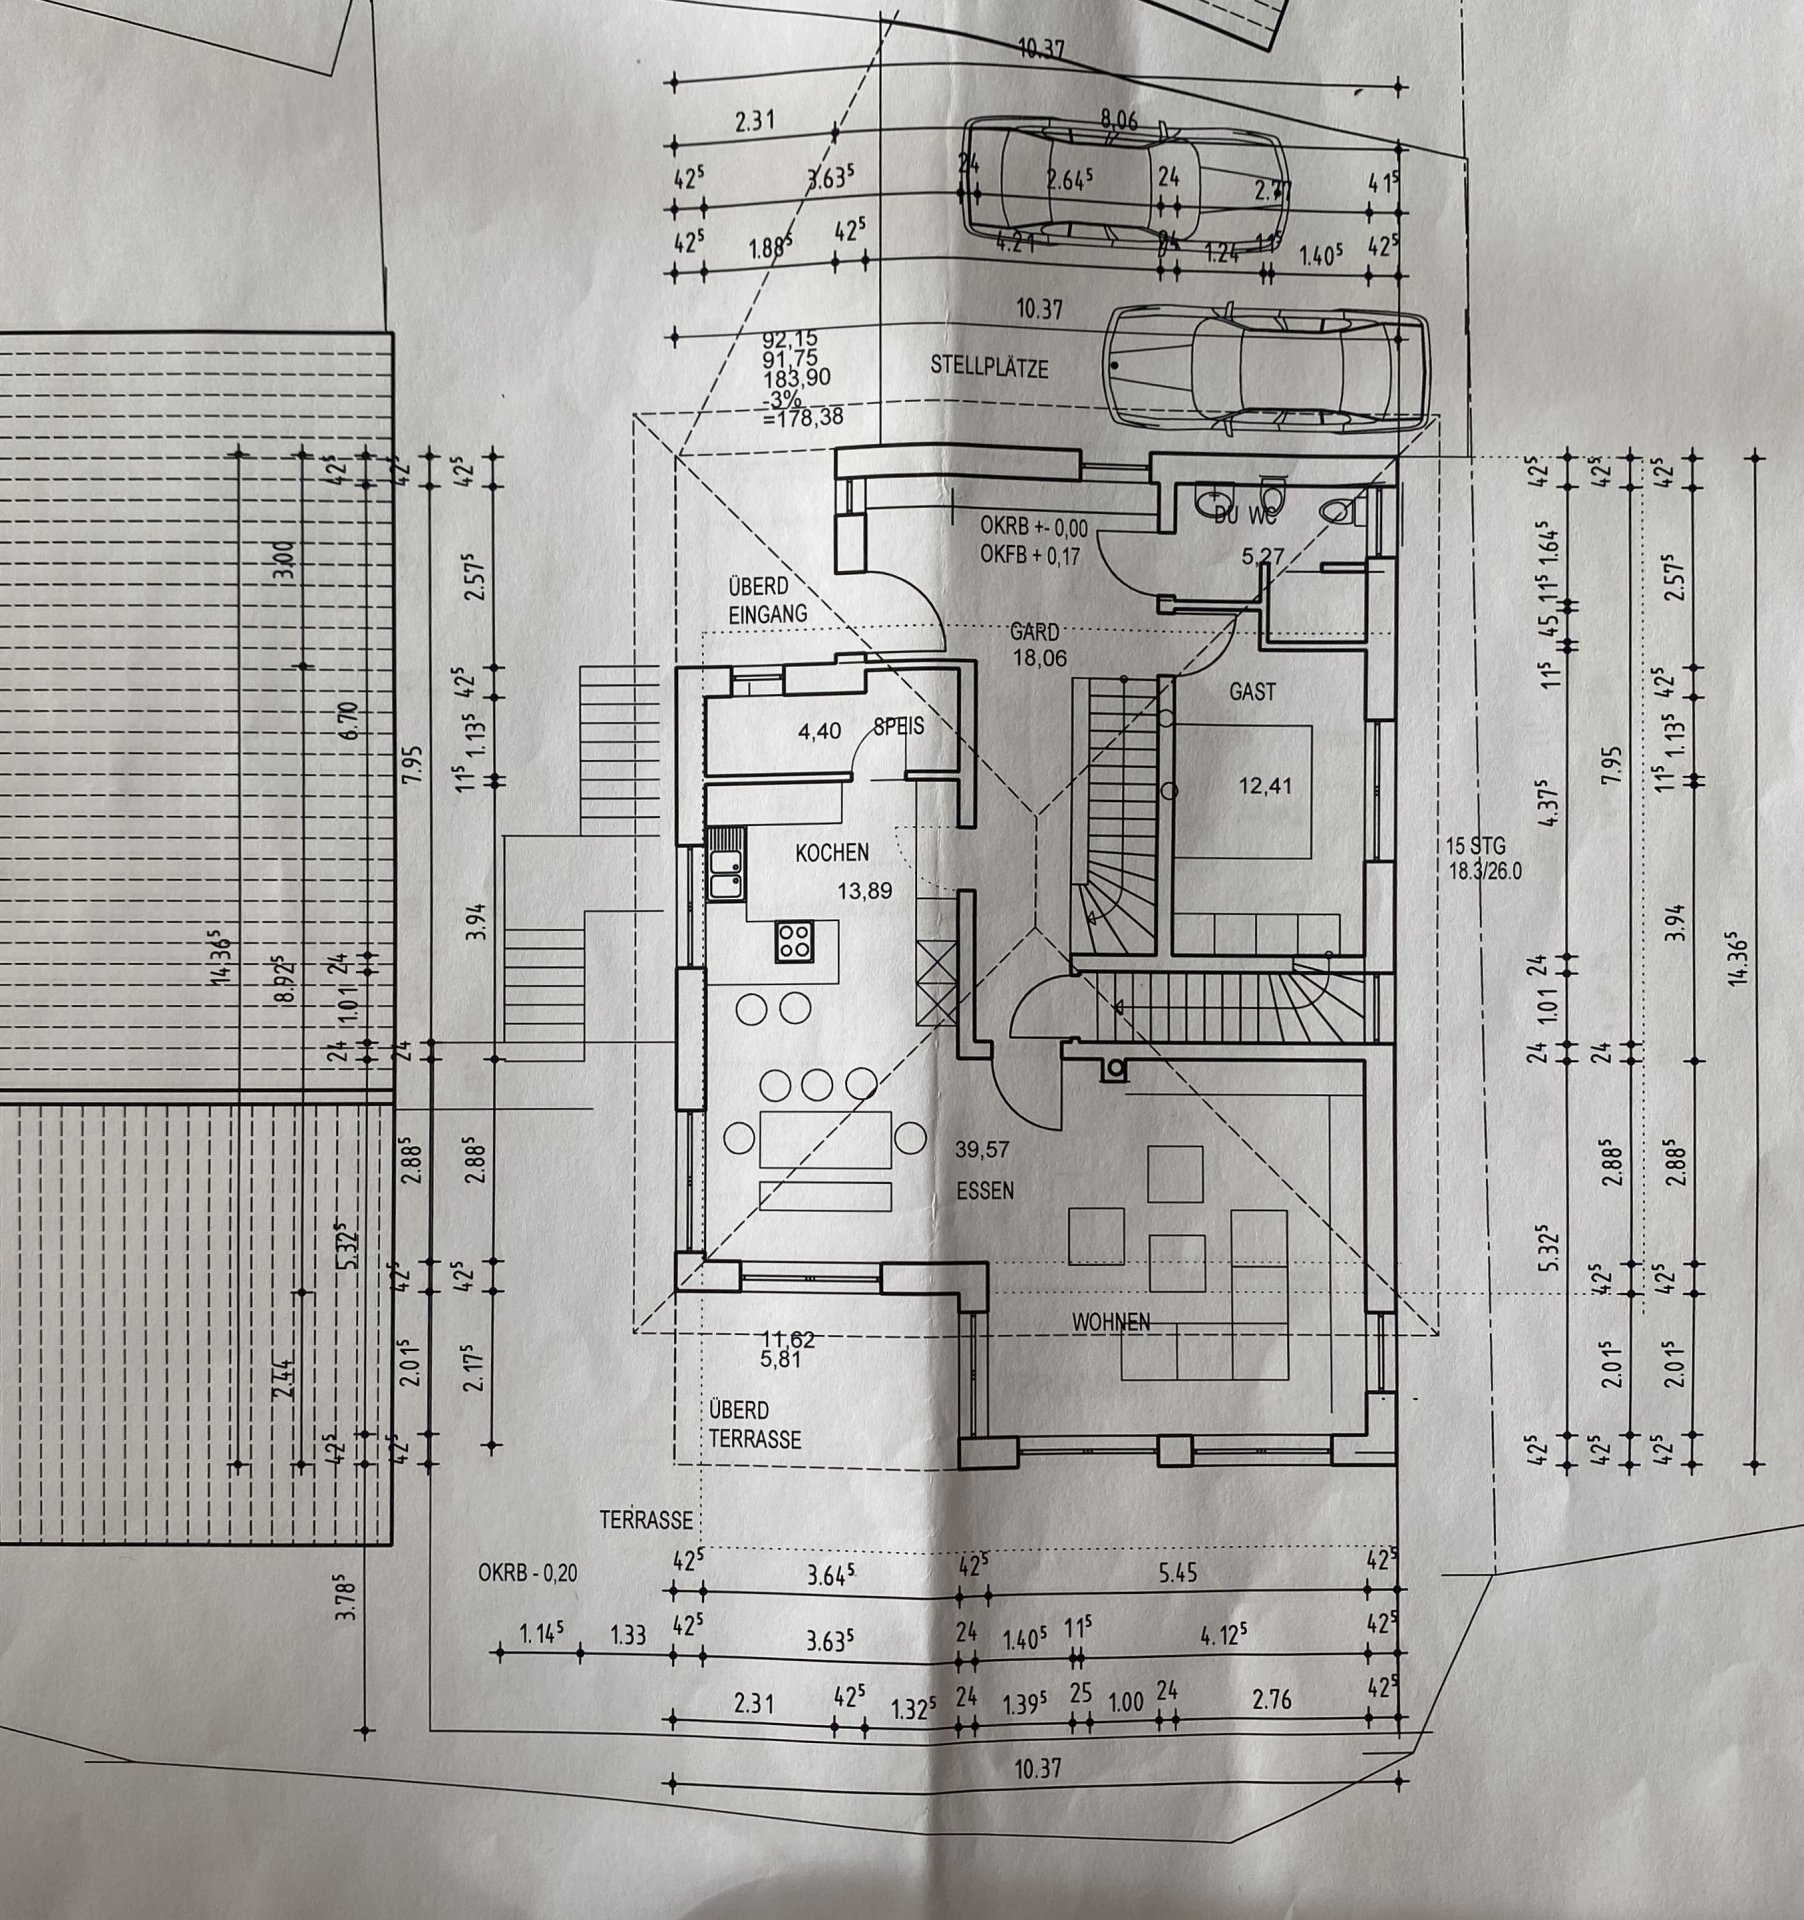 3D594233-2BDE-4682-9143-7A7BC5CF598A.jpeg